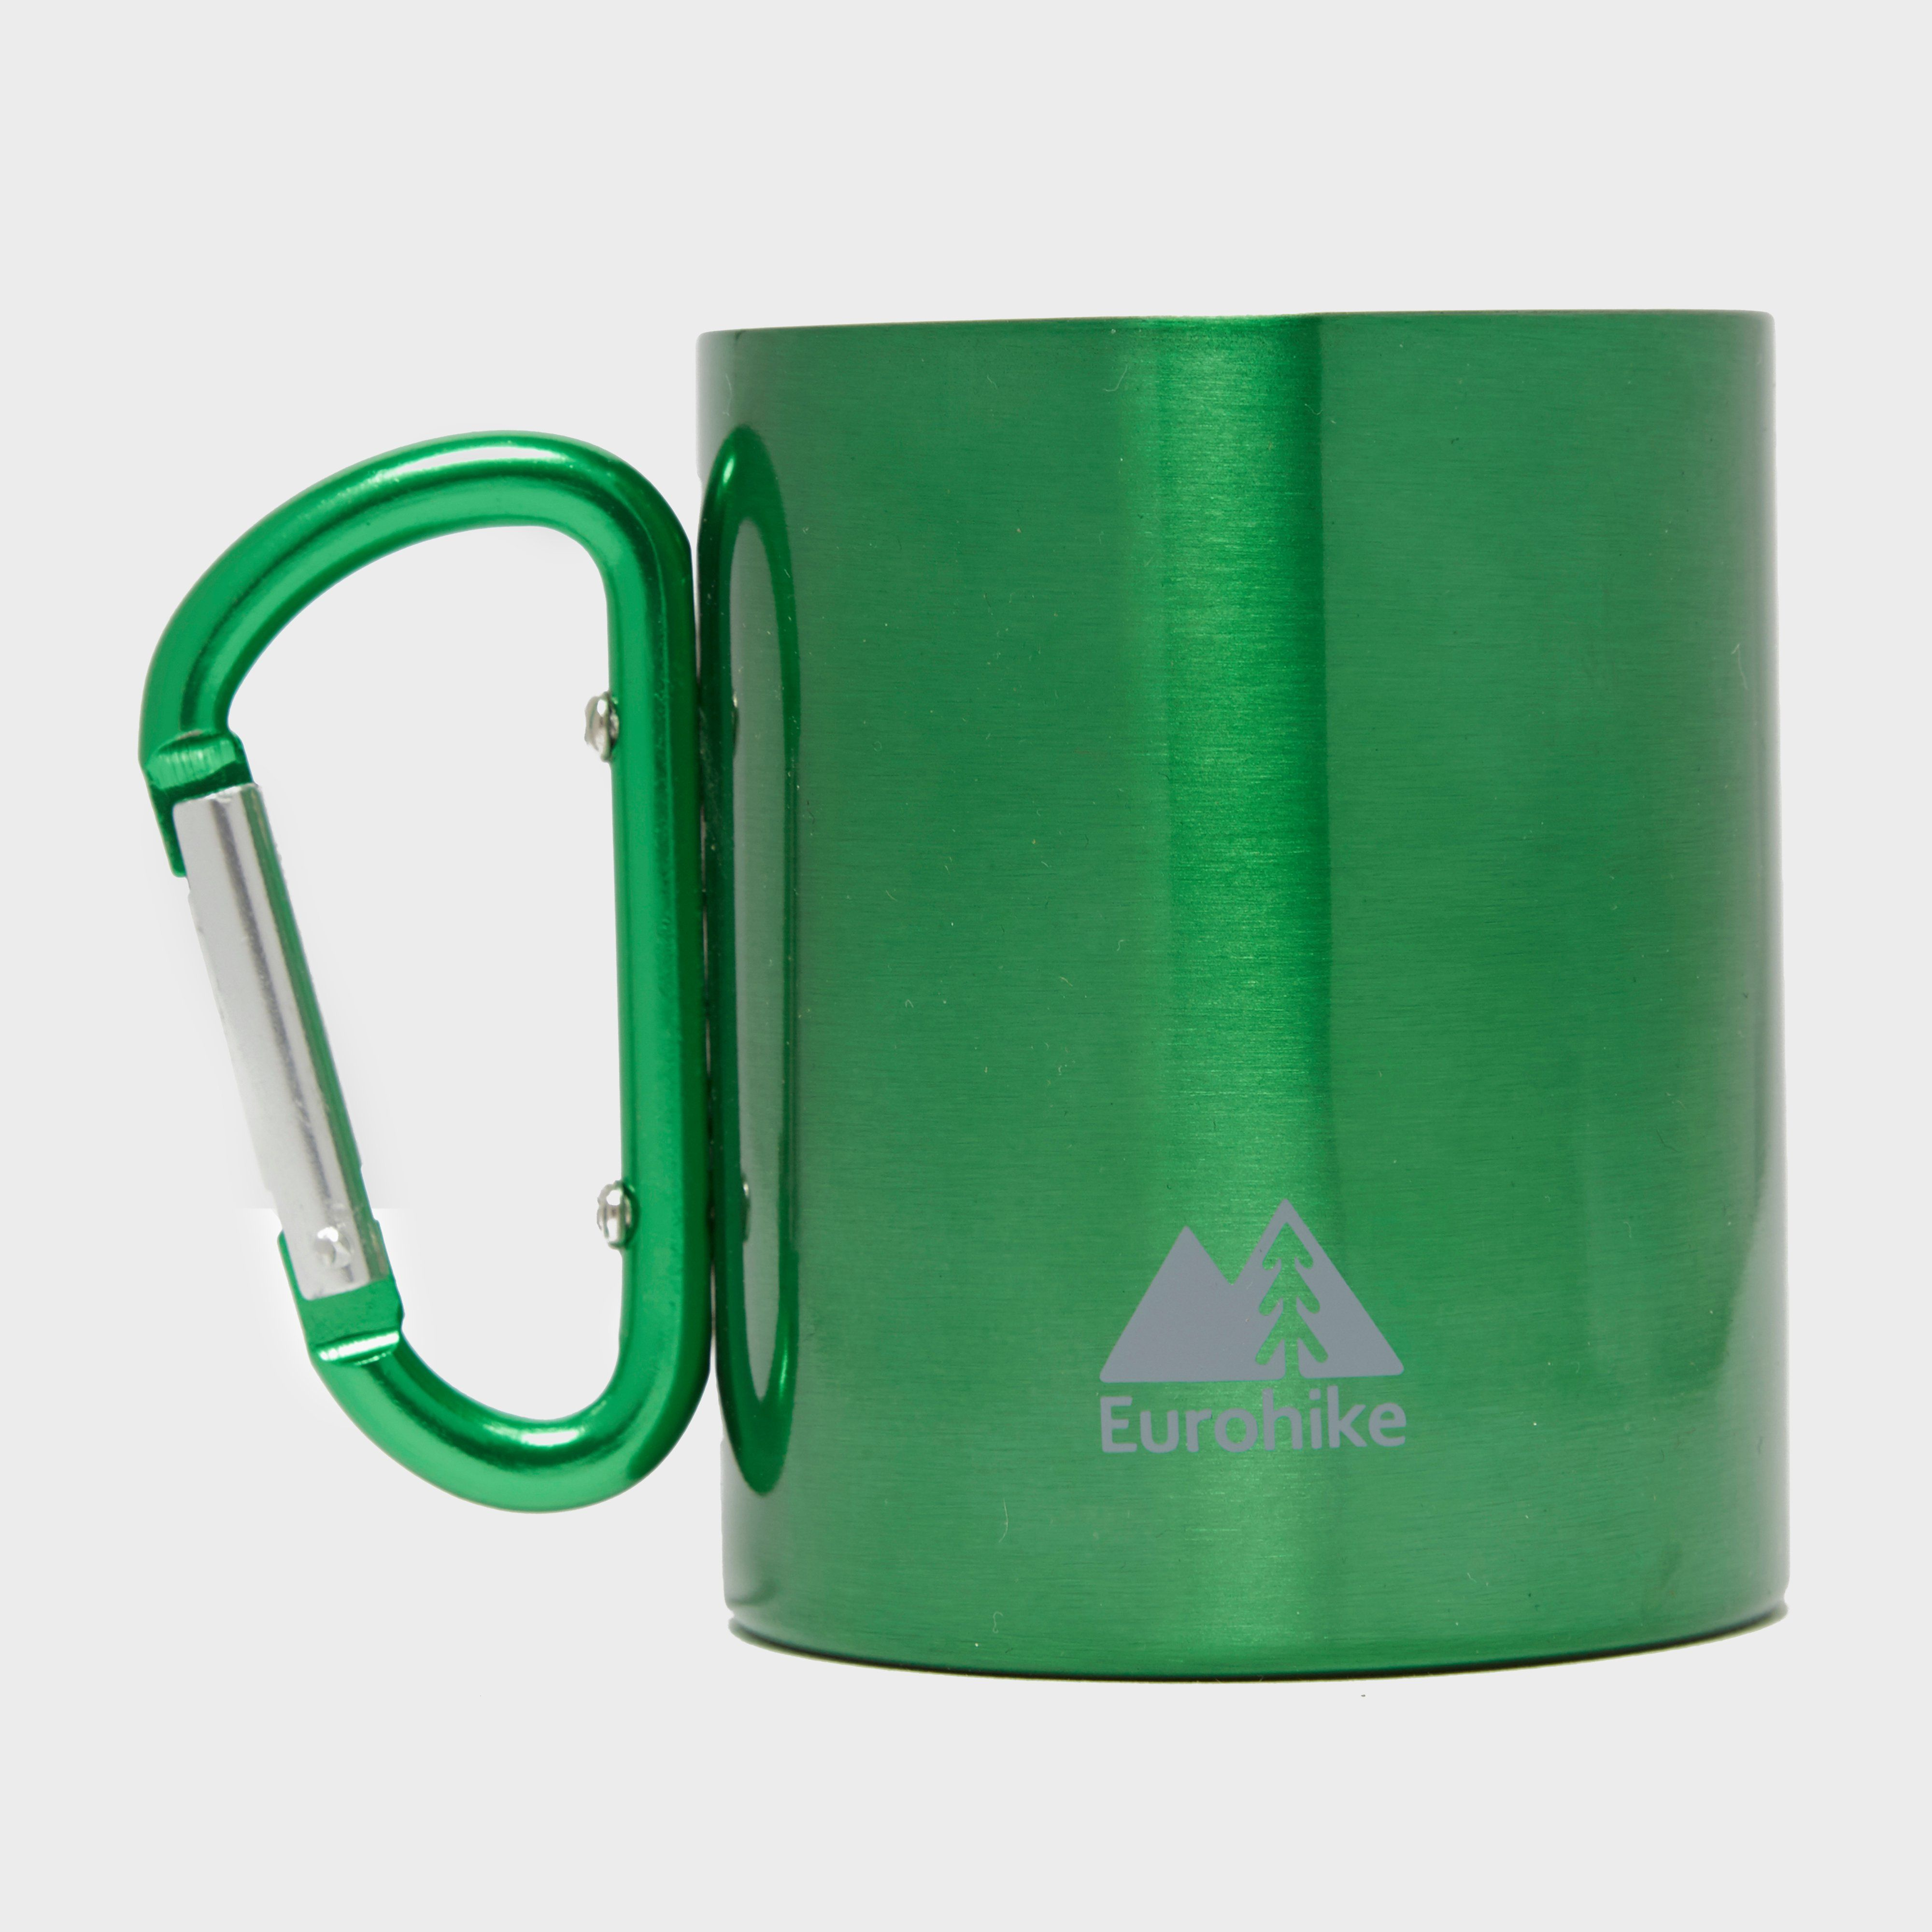 EUROHIKE Carabiner Handle Mug